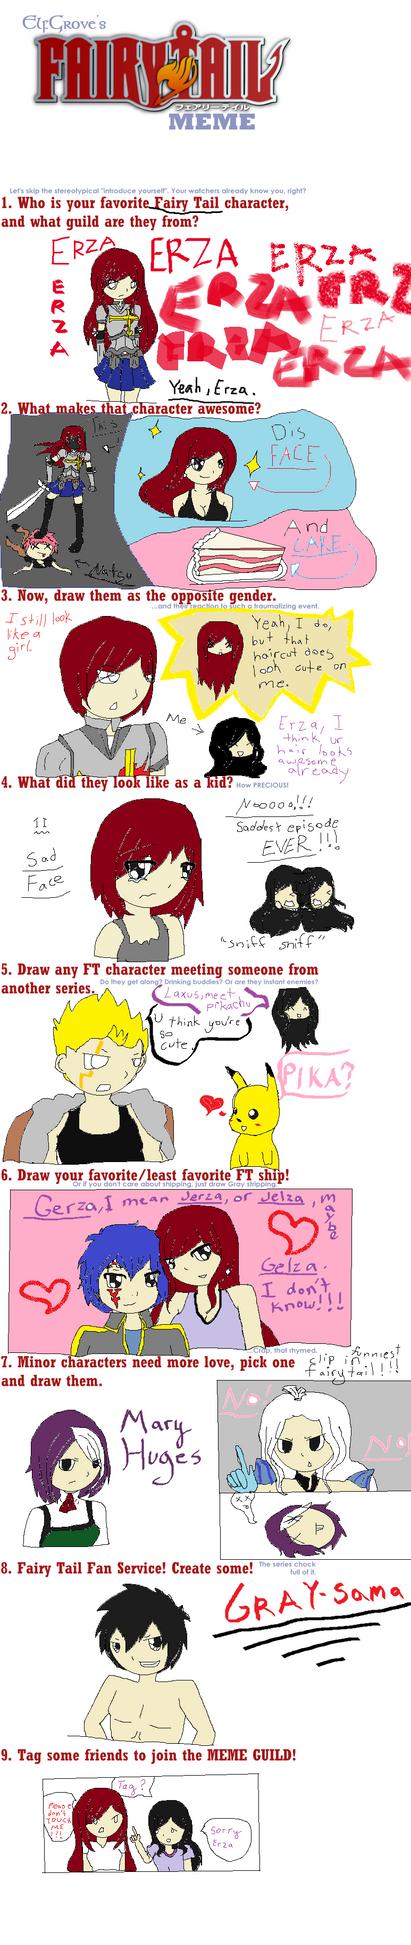 Fairy Tail Meme By Twilightkira27 On Deviantart